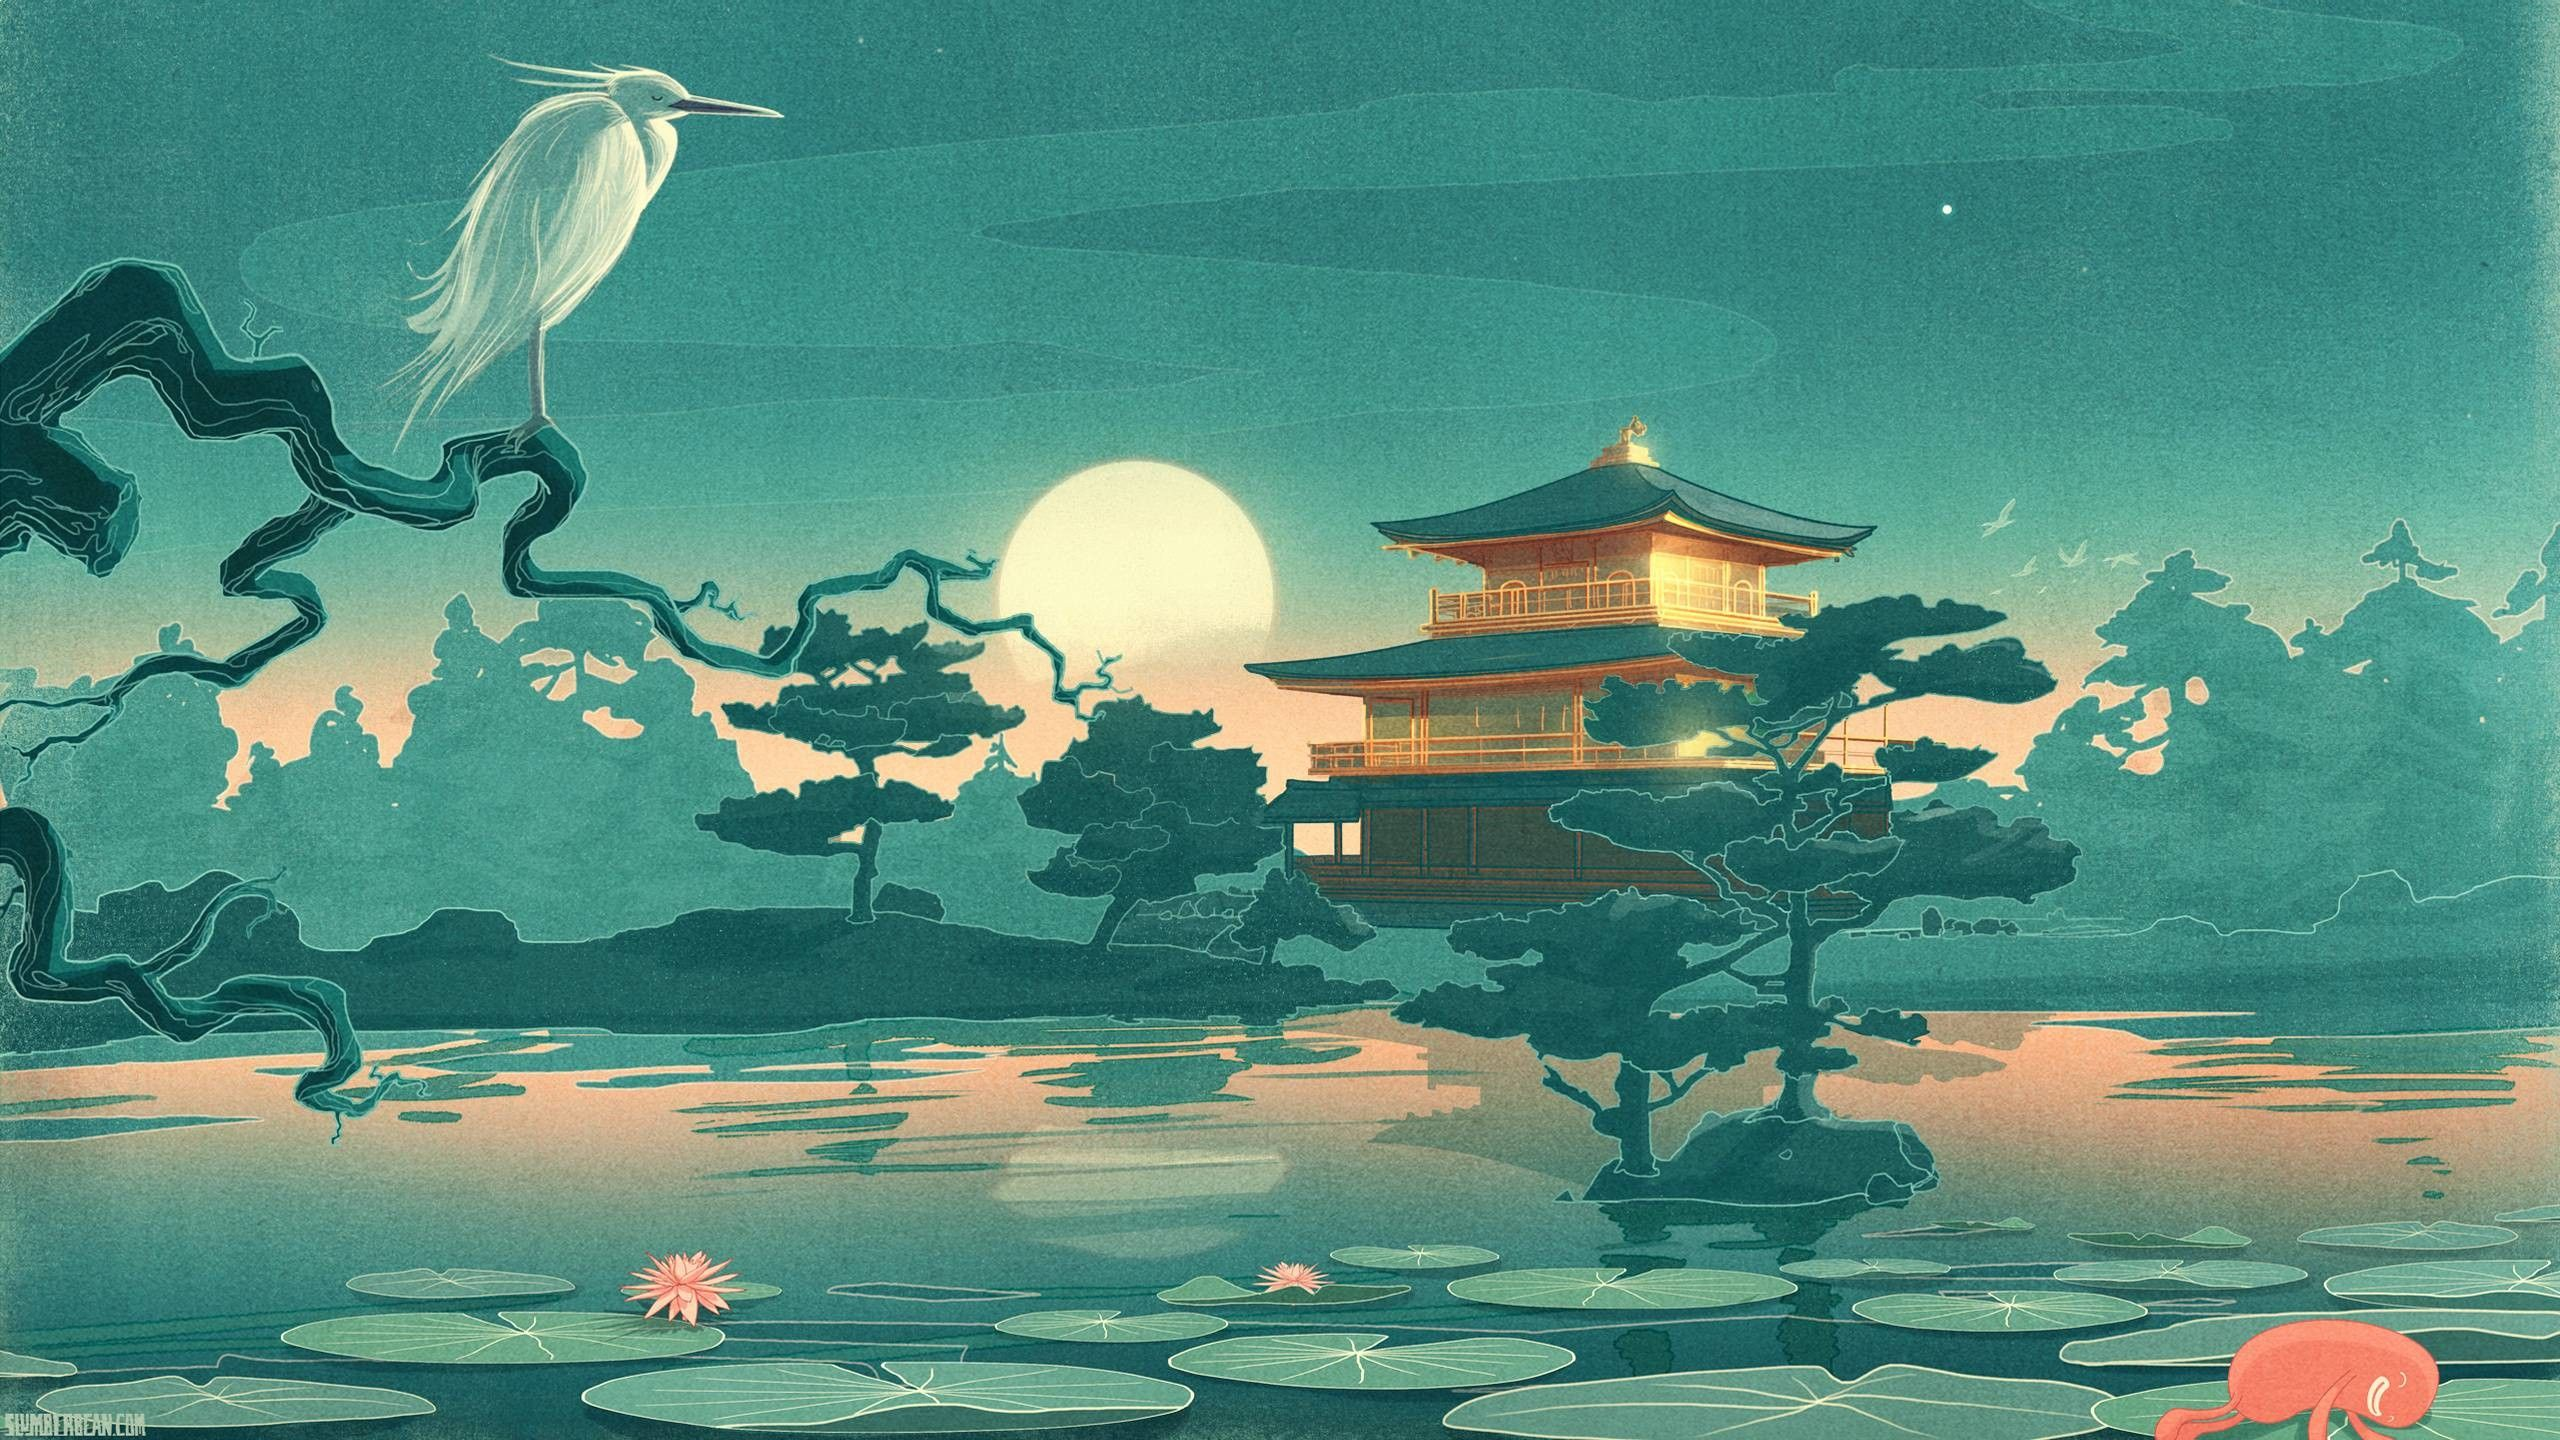 Pix For Japanese Art Wallpaper 2560x1440 Art Wallpaper Japanese Art Painting Wallpaper